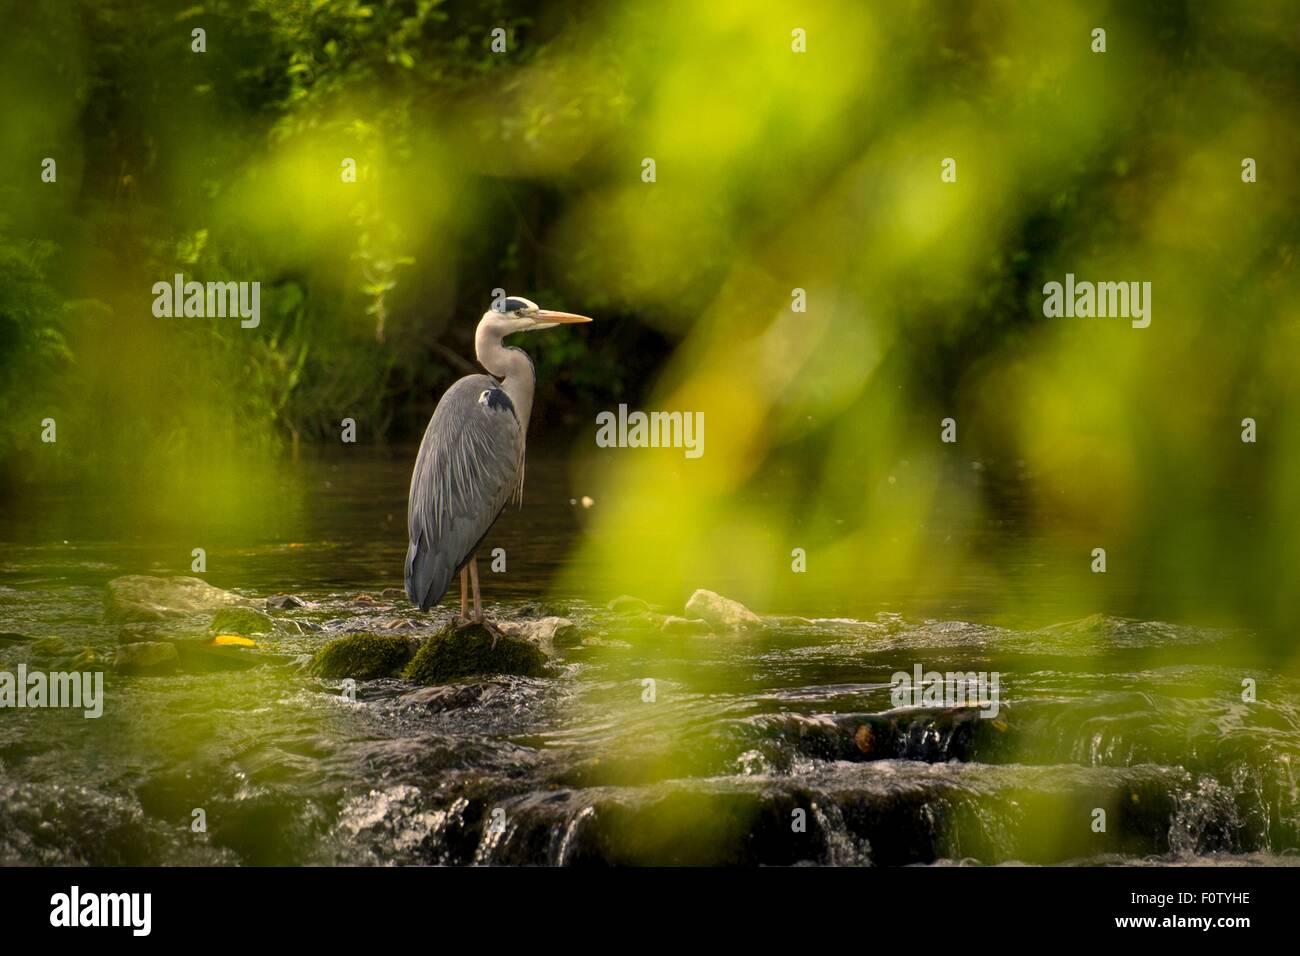 Crane bird, County Kerry, Ireland - Stock Image